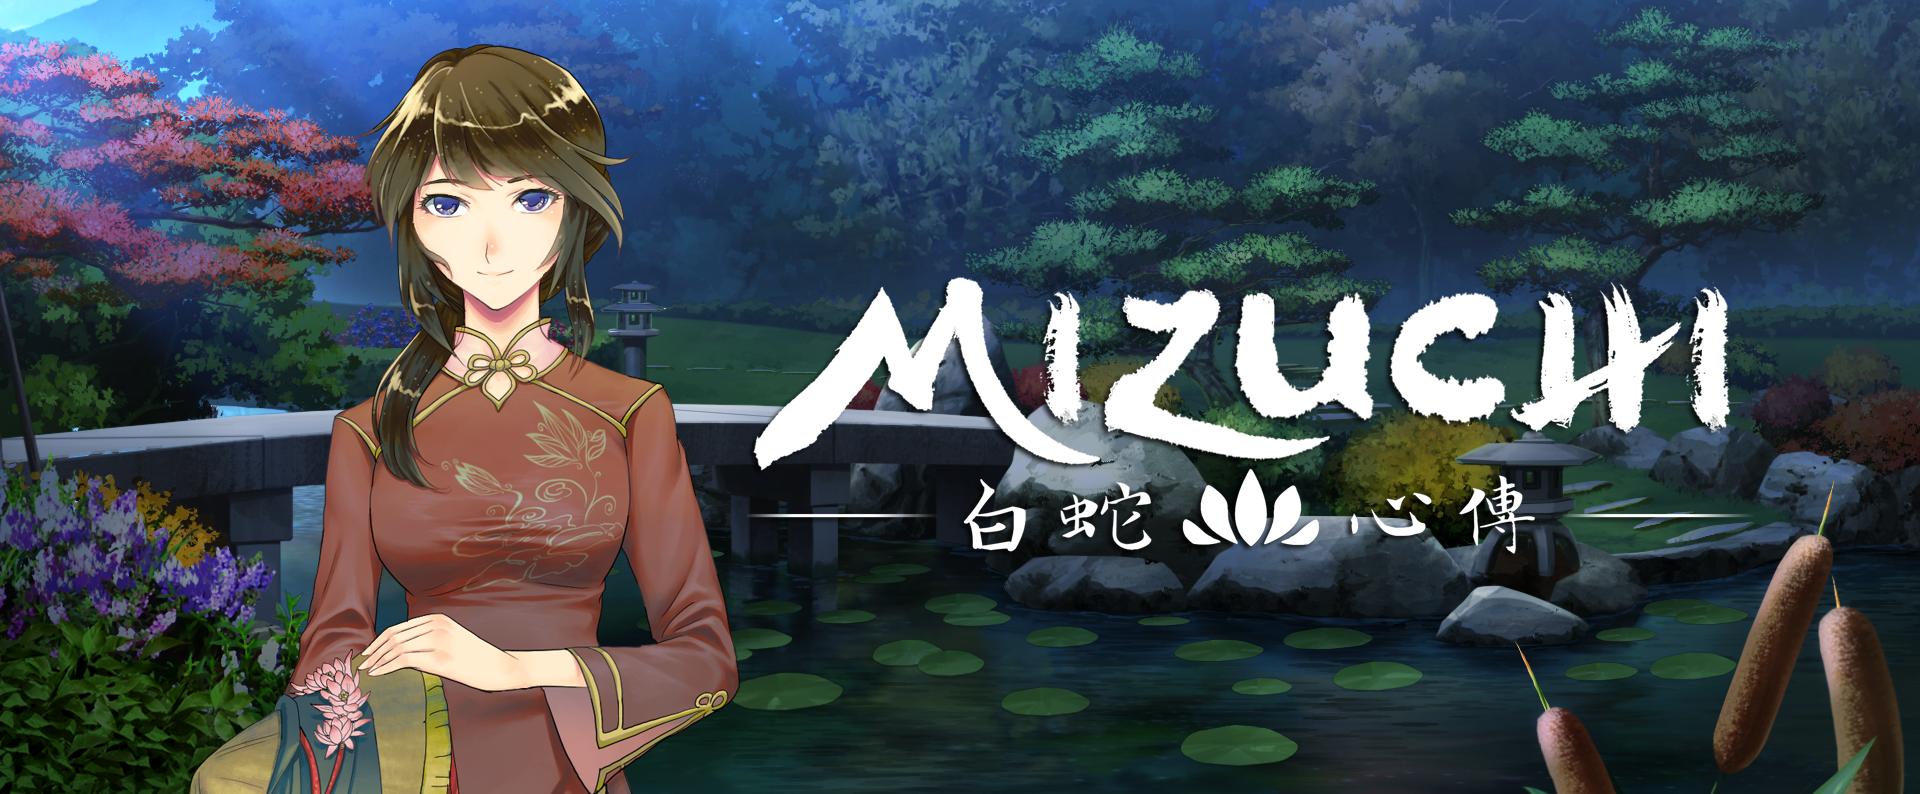 Mizuchi 白蛇心傳